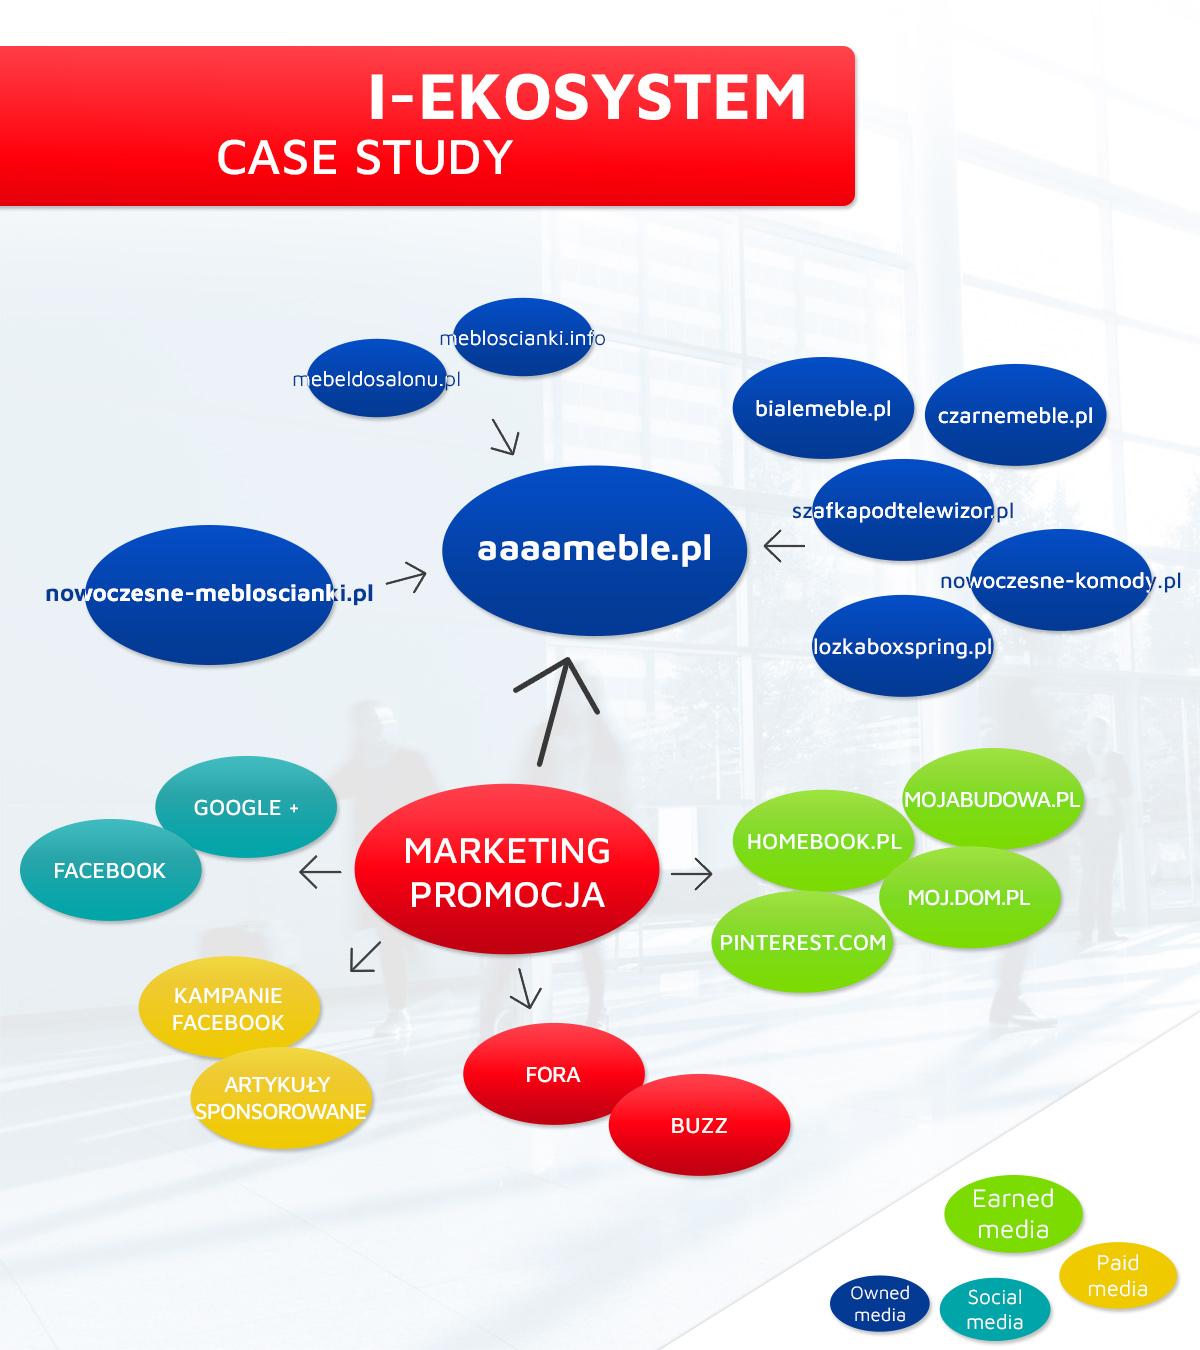 Zaplecze contentowe case study